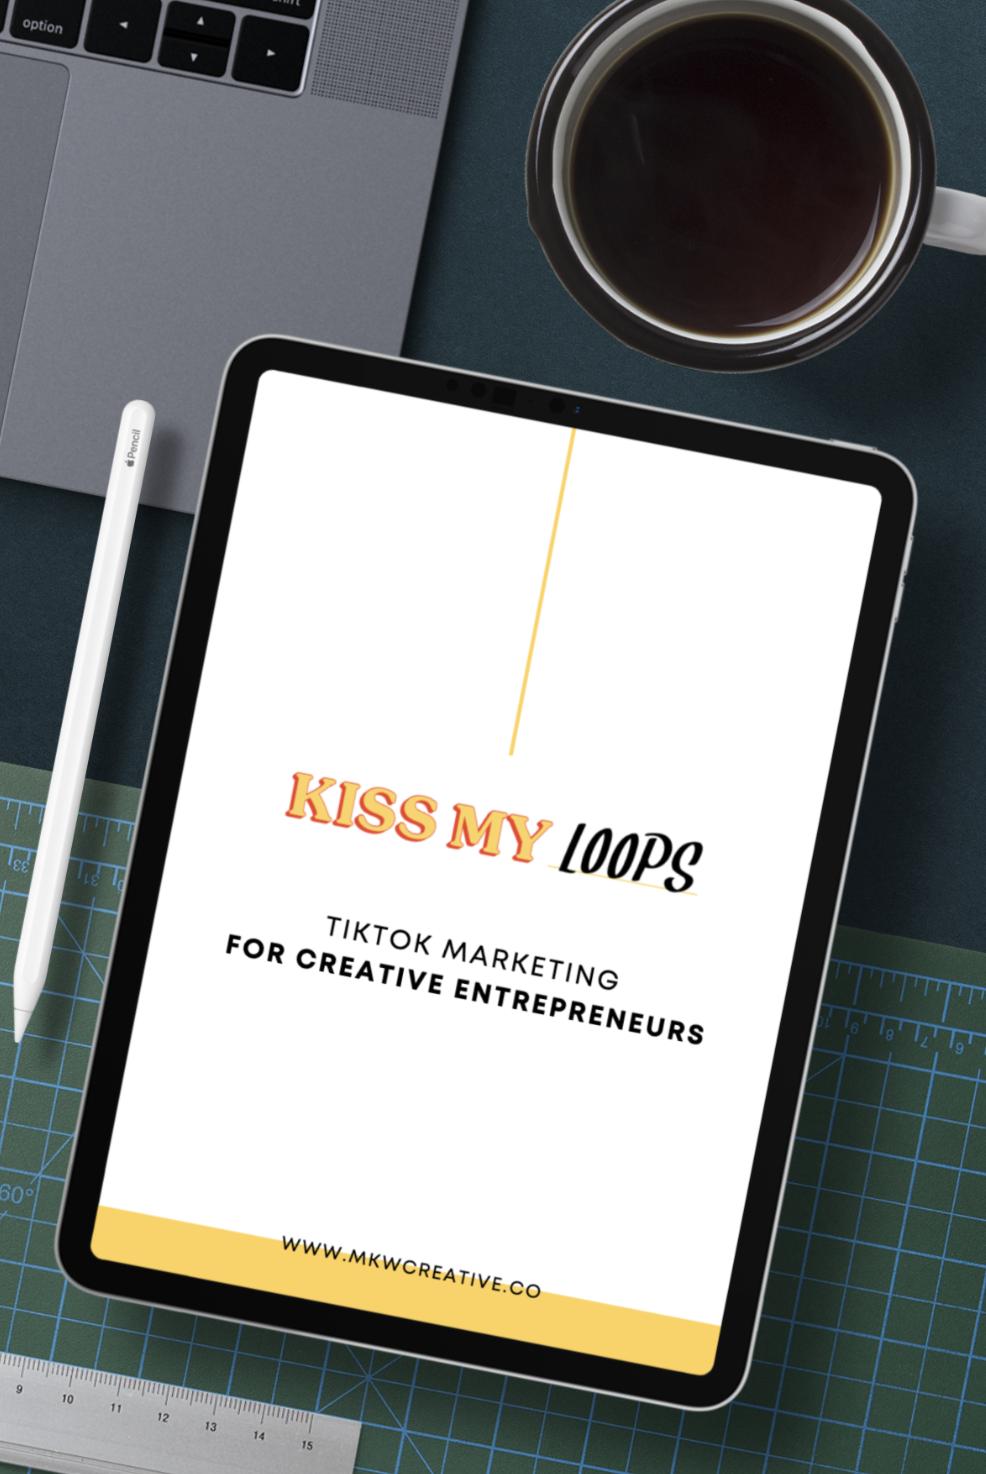 Kiss My Loops Tiktok For Creatives Workbook Mkw Creative Co Social Media Advice Workbook Creative Entrepreneurs